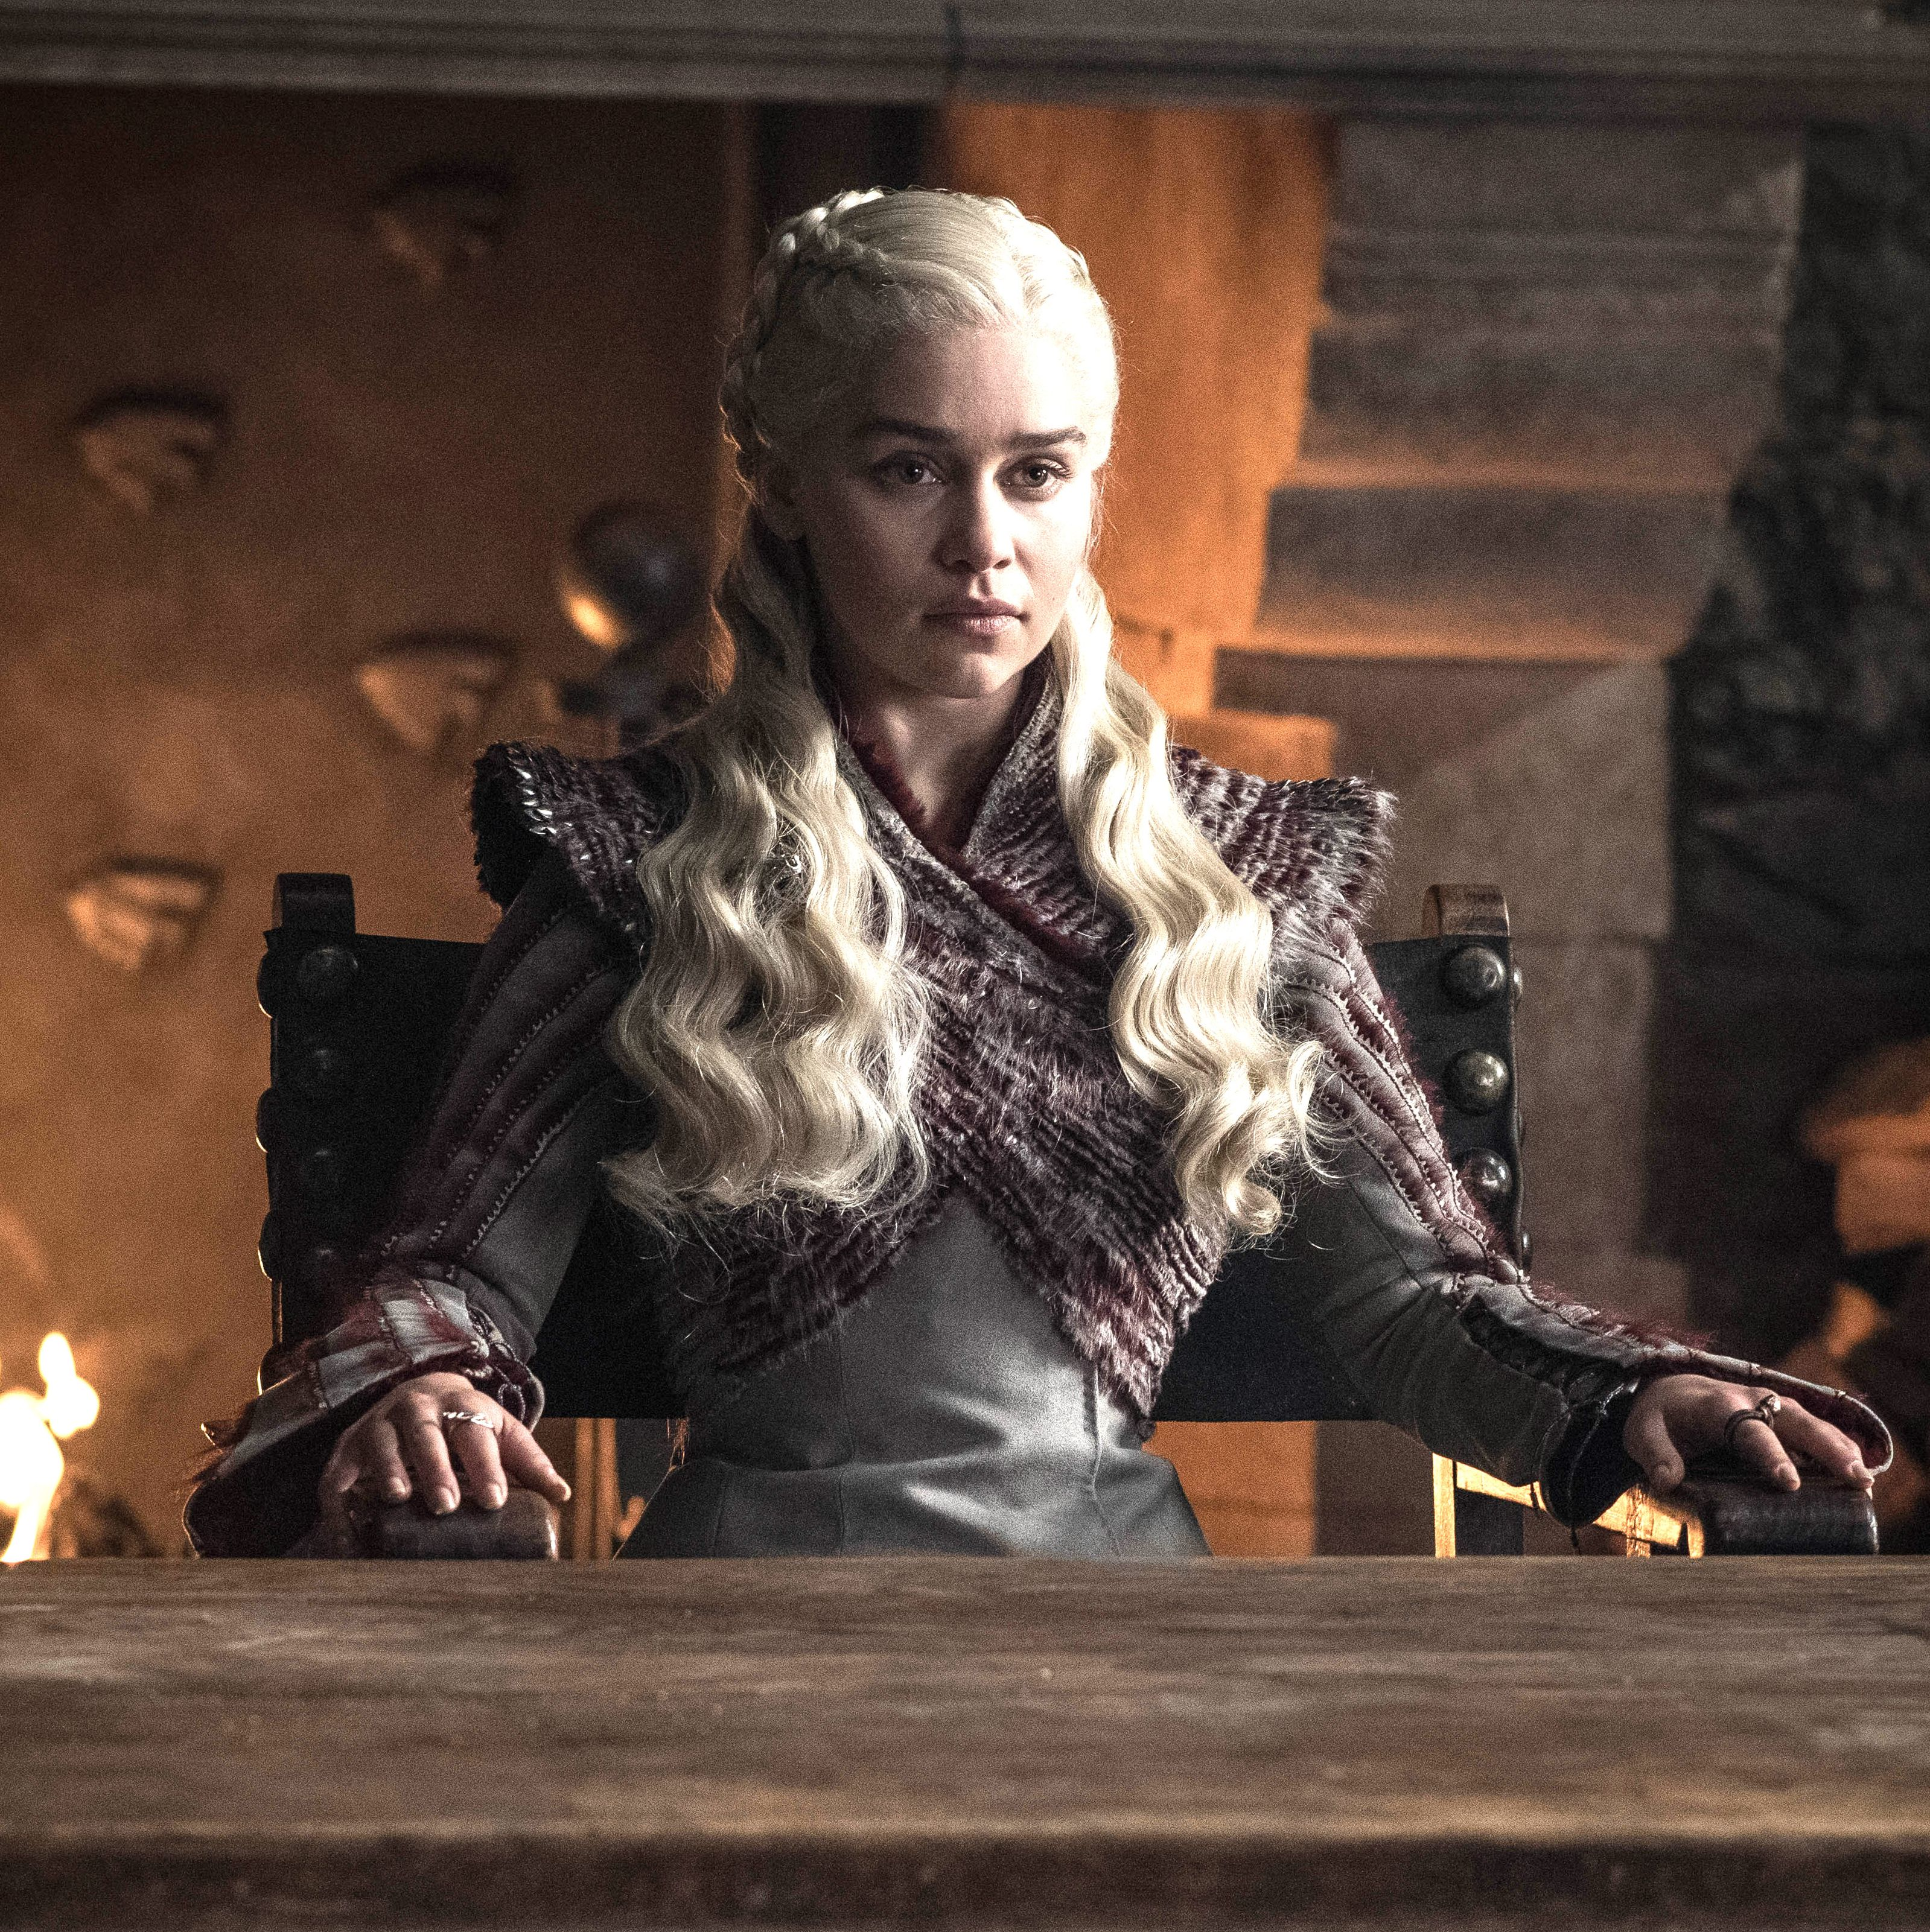 Game of Thrones fan launches petition dedicated to Emilia Clarke's Daenerys Targaryen